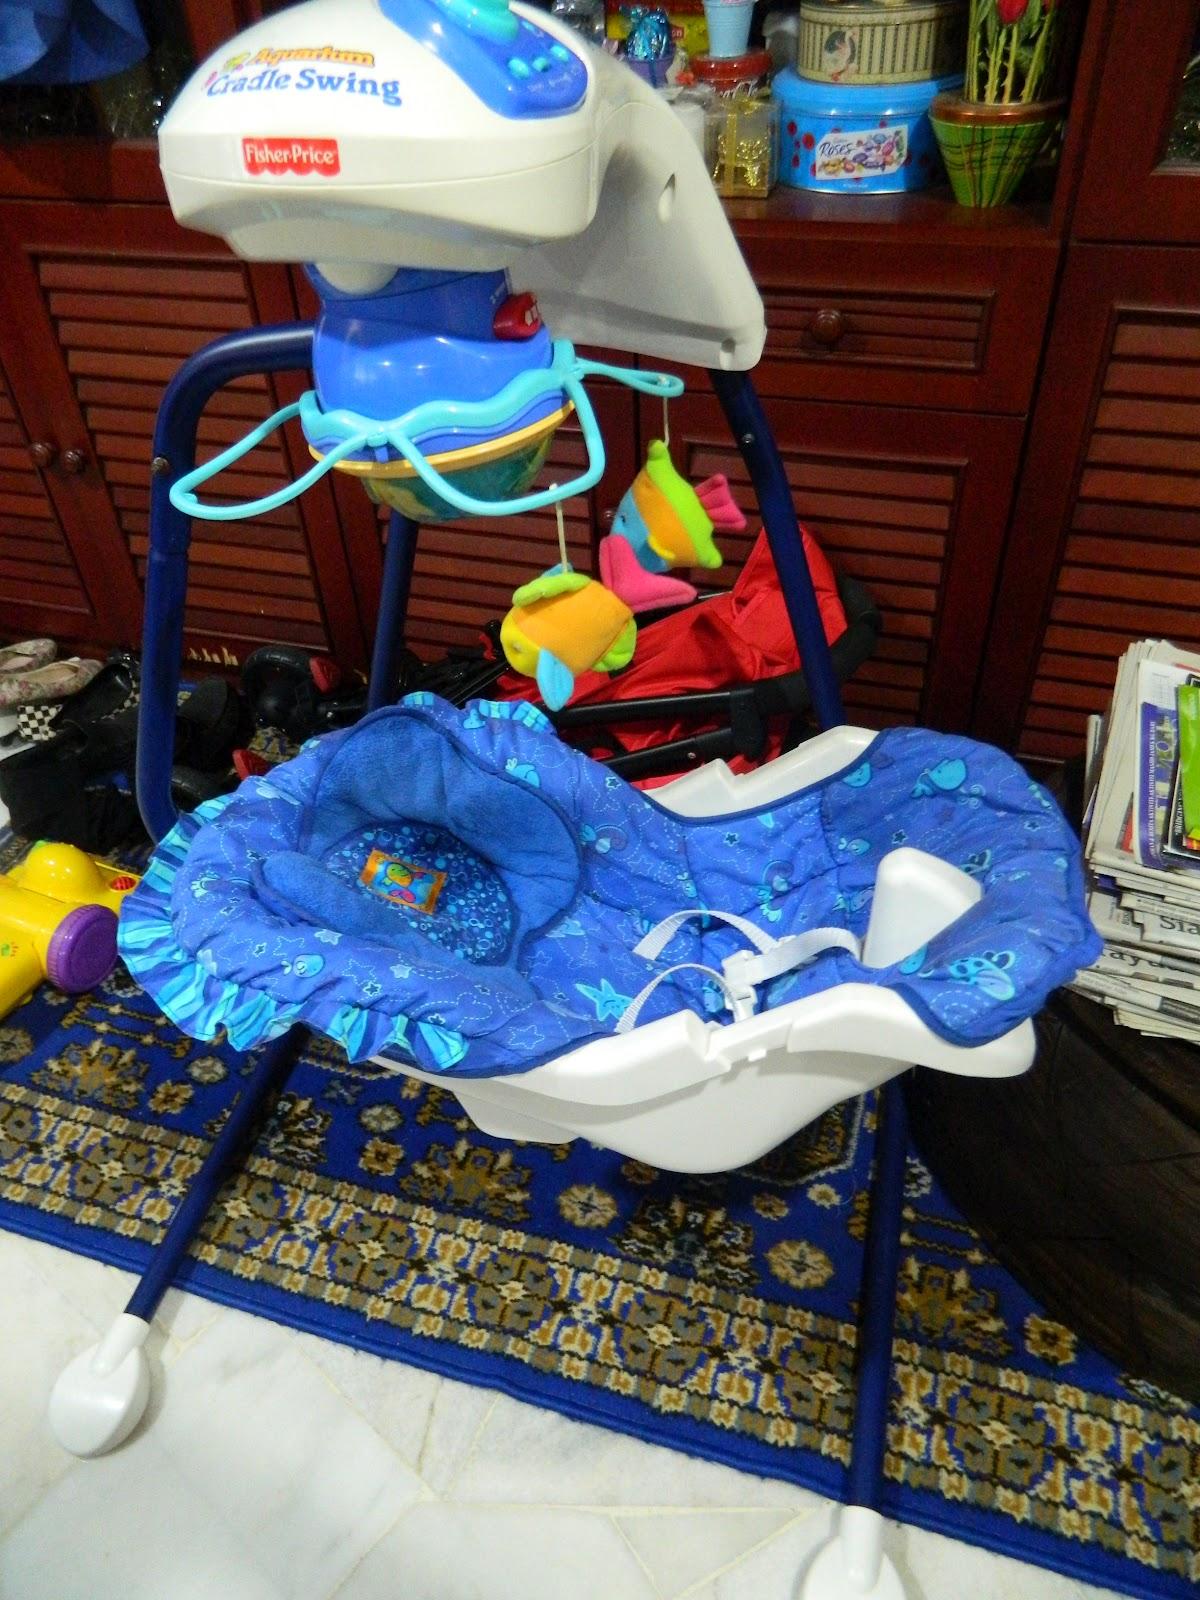 Save On Toys FisherPrice Aquarium Cradle Swing Ocean